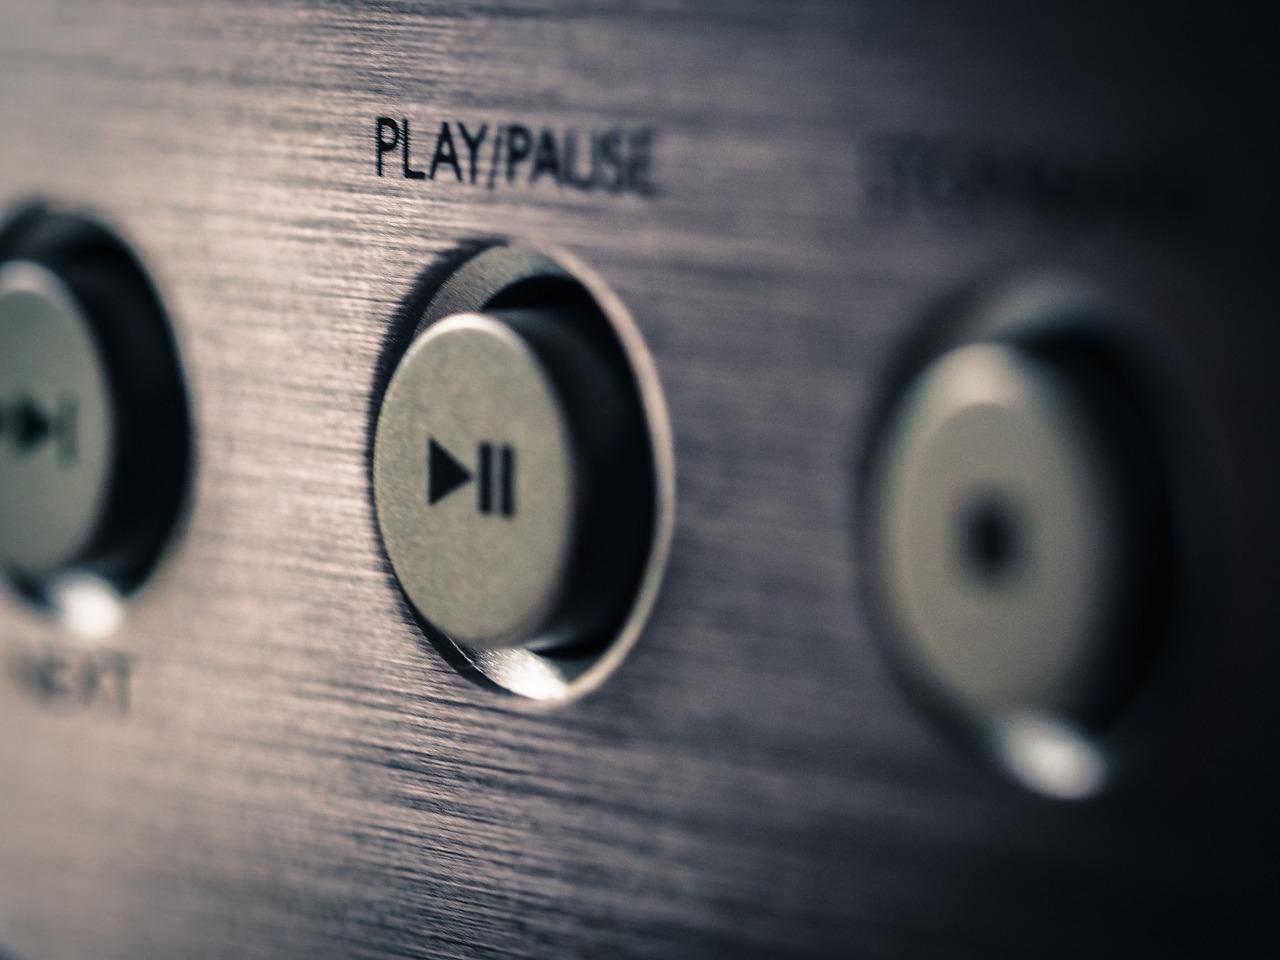 La touche play - pause